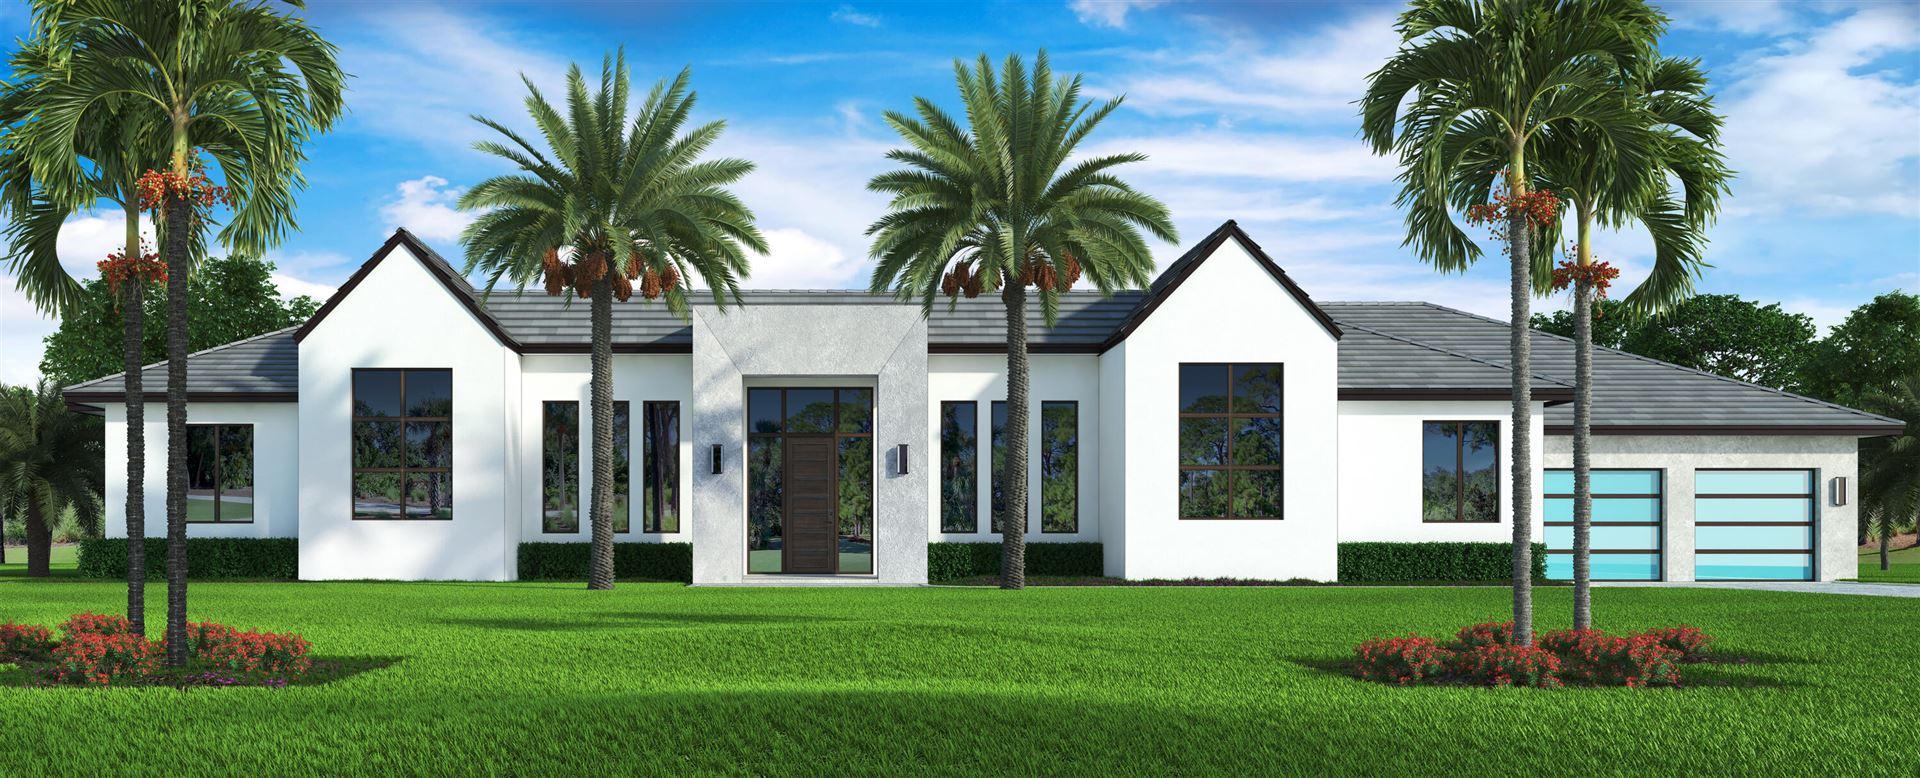 Photo of 3112 Blue Cypress Lane, Wellington, FL 33414 (MLS # RX-10716833)